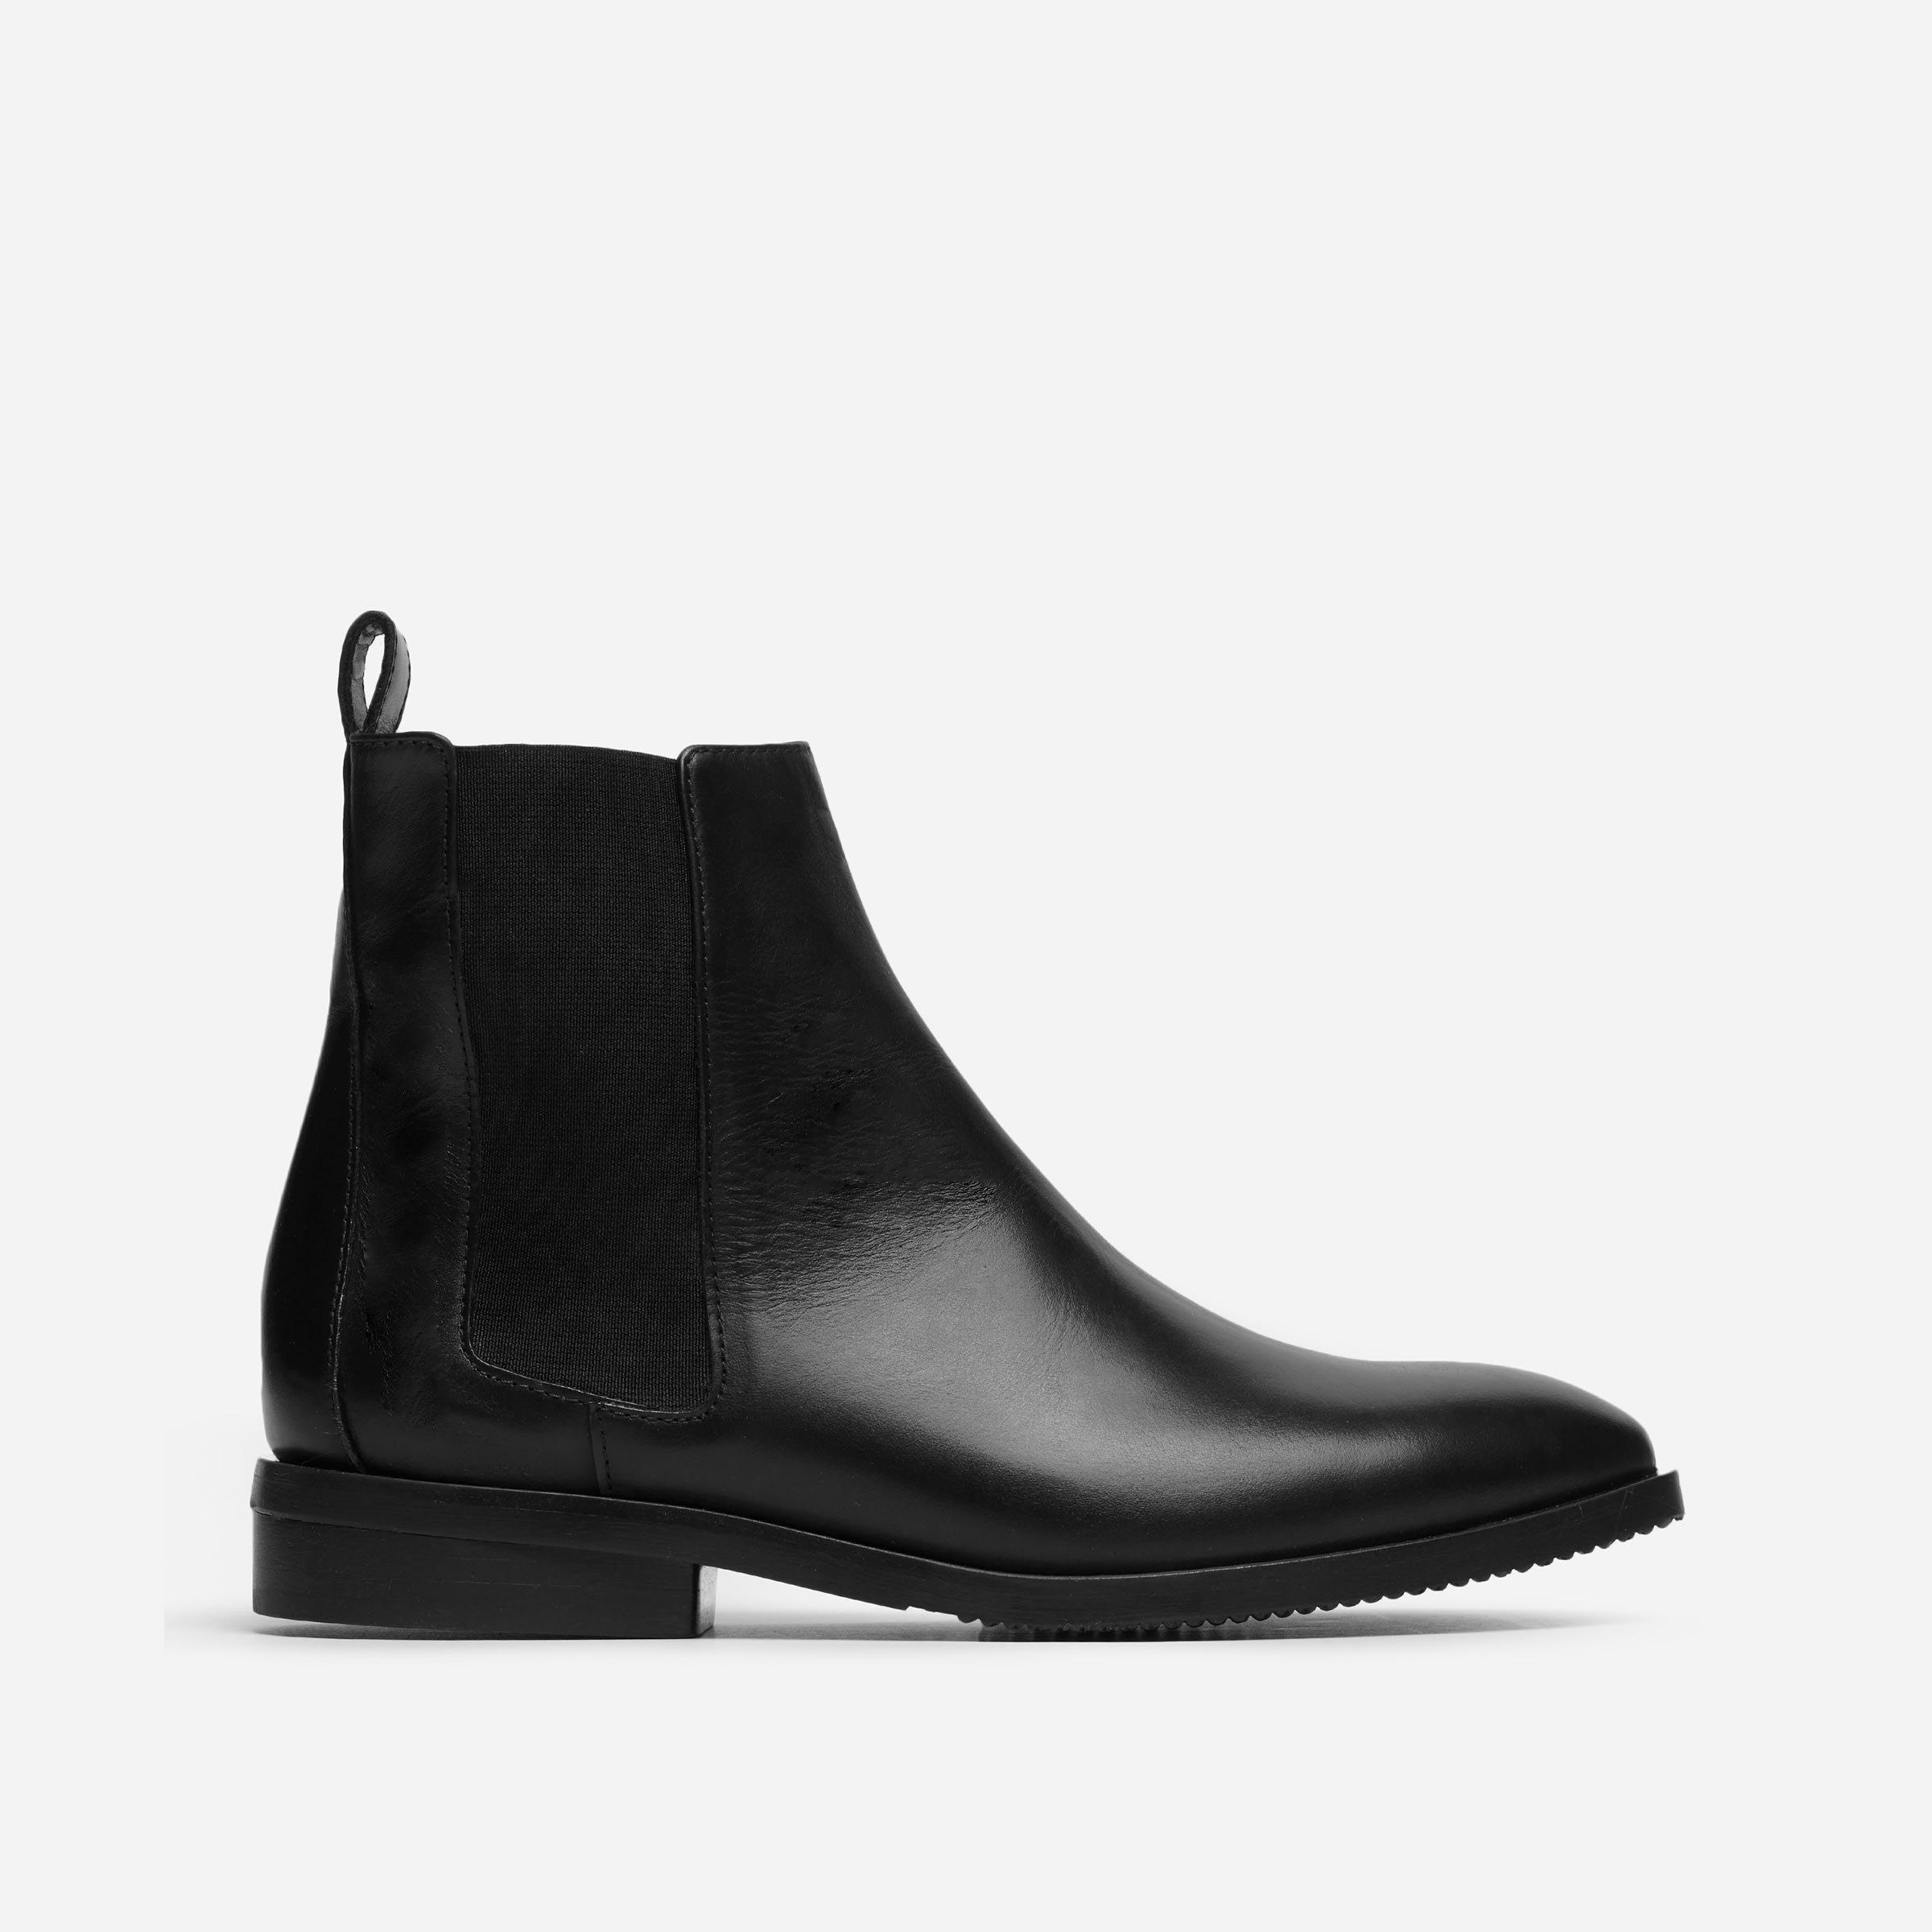 7326865ead1 The Modern Chelsea Boot